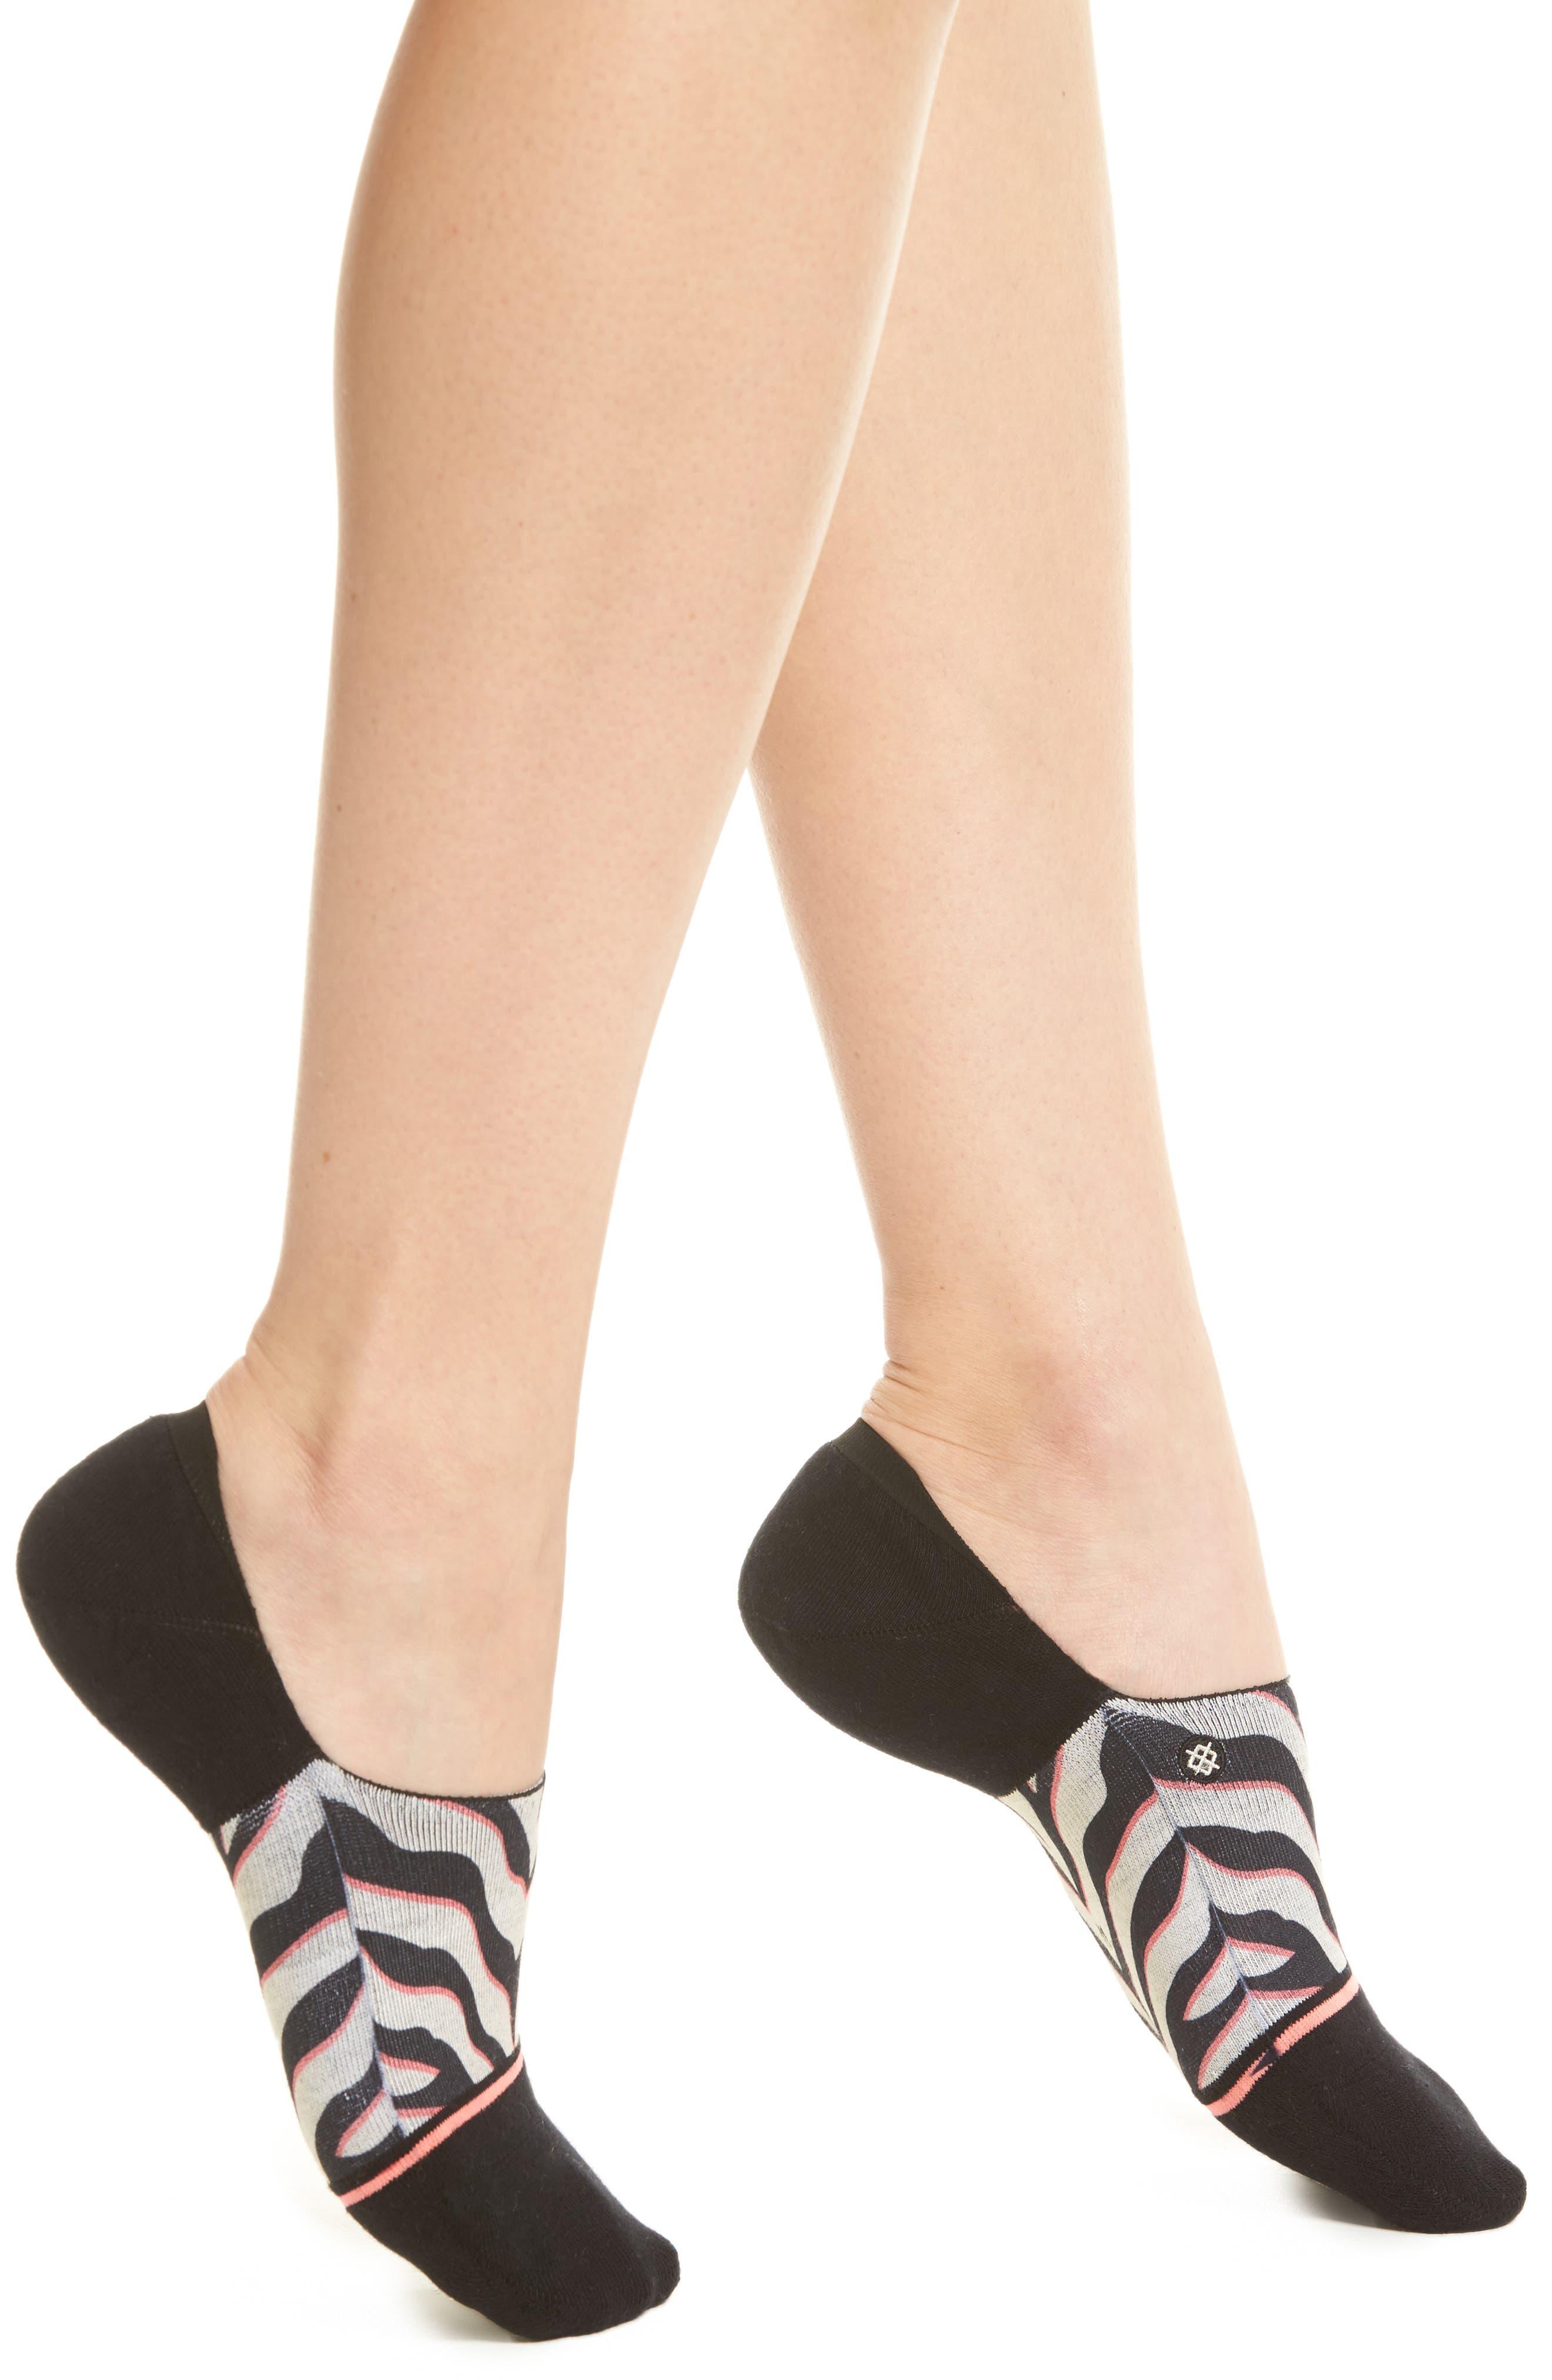 Checotah Super Invisible No-Show Socks,                         Main,                         color, BLACK